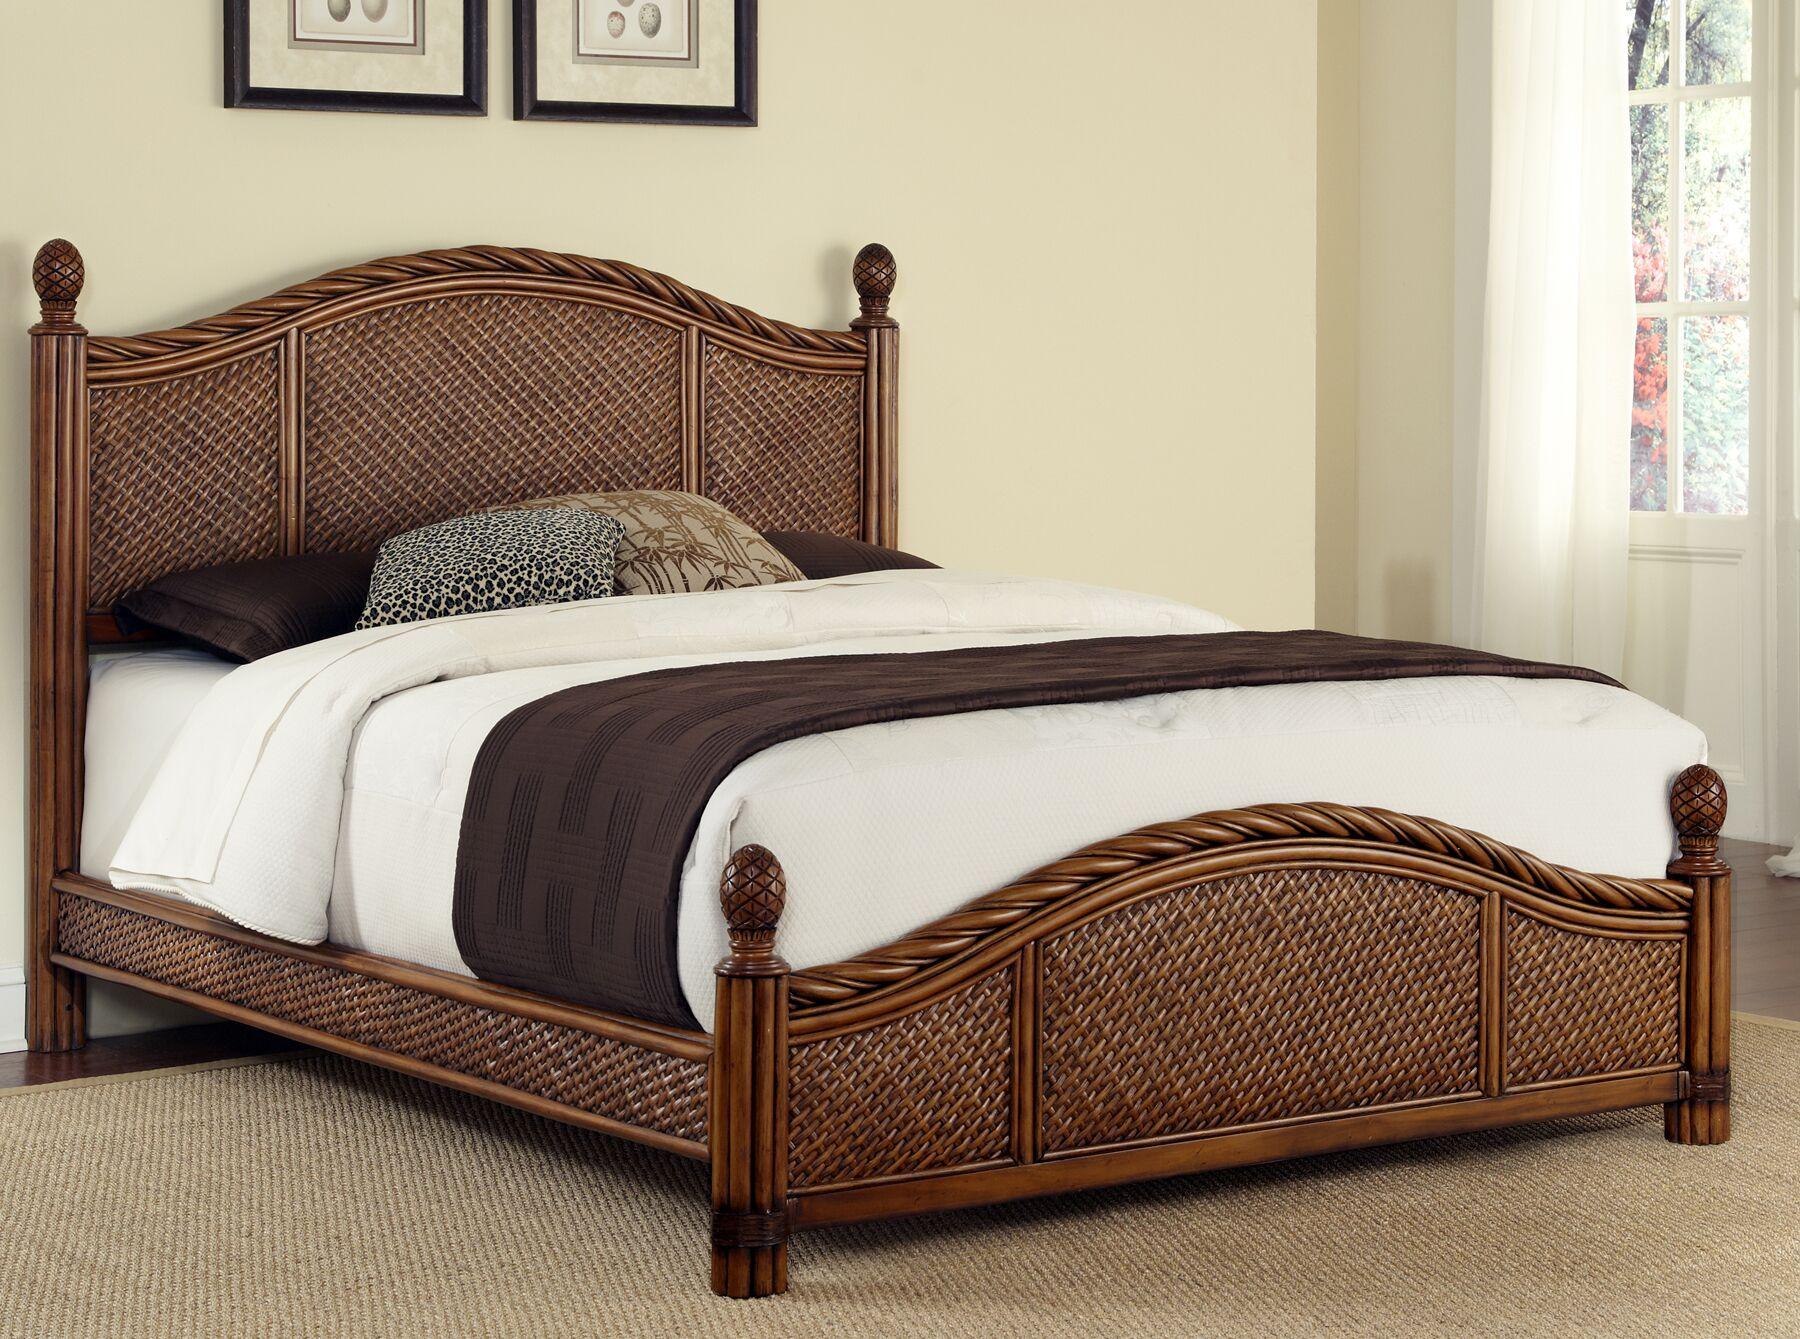 Dessie Panel Bed Size: King, Color: Cinnamon